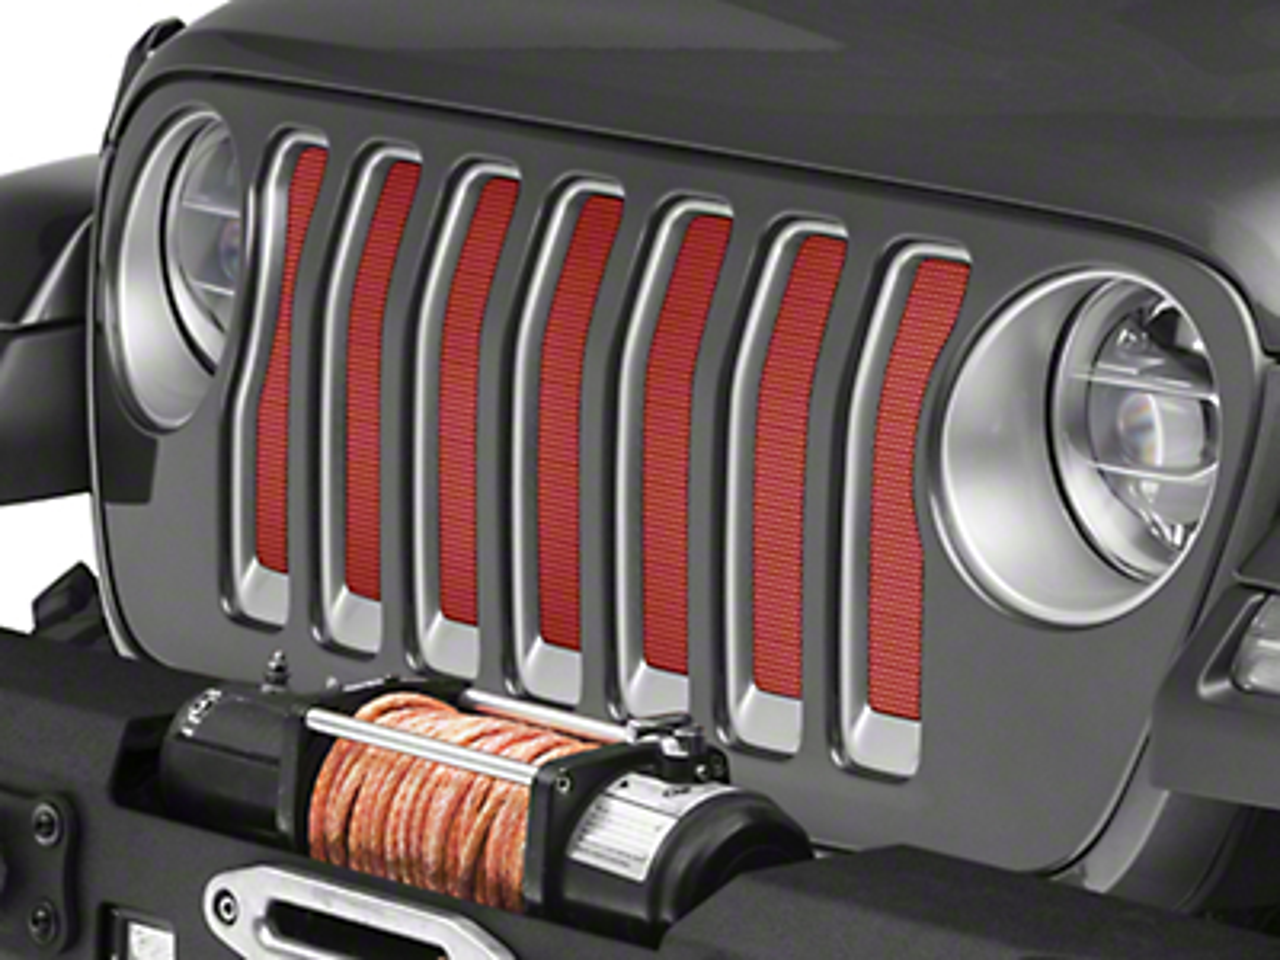 Under the Sun Grille Insert - Rock Lobster (2018 Jeep Wrangler JL)